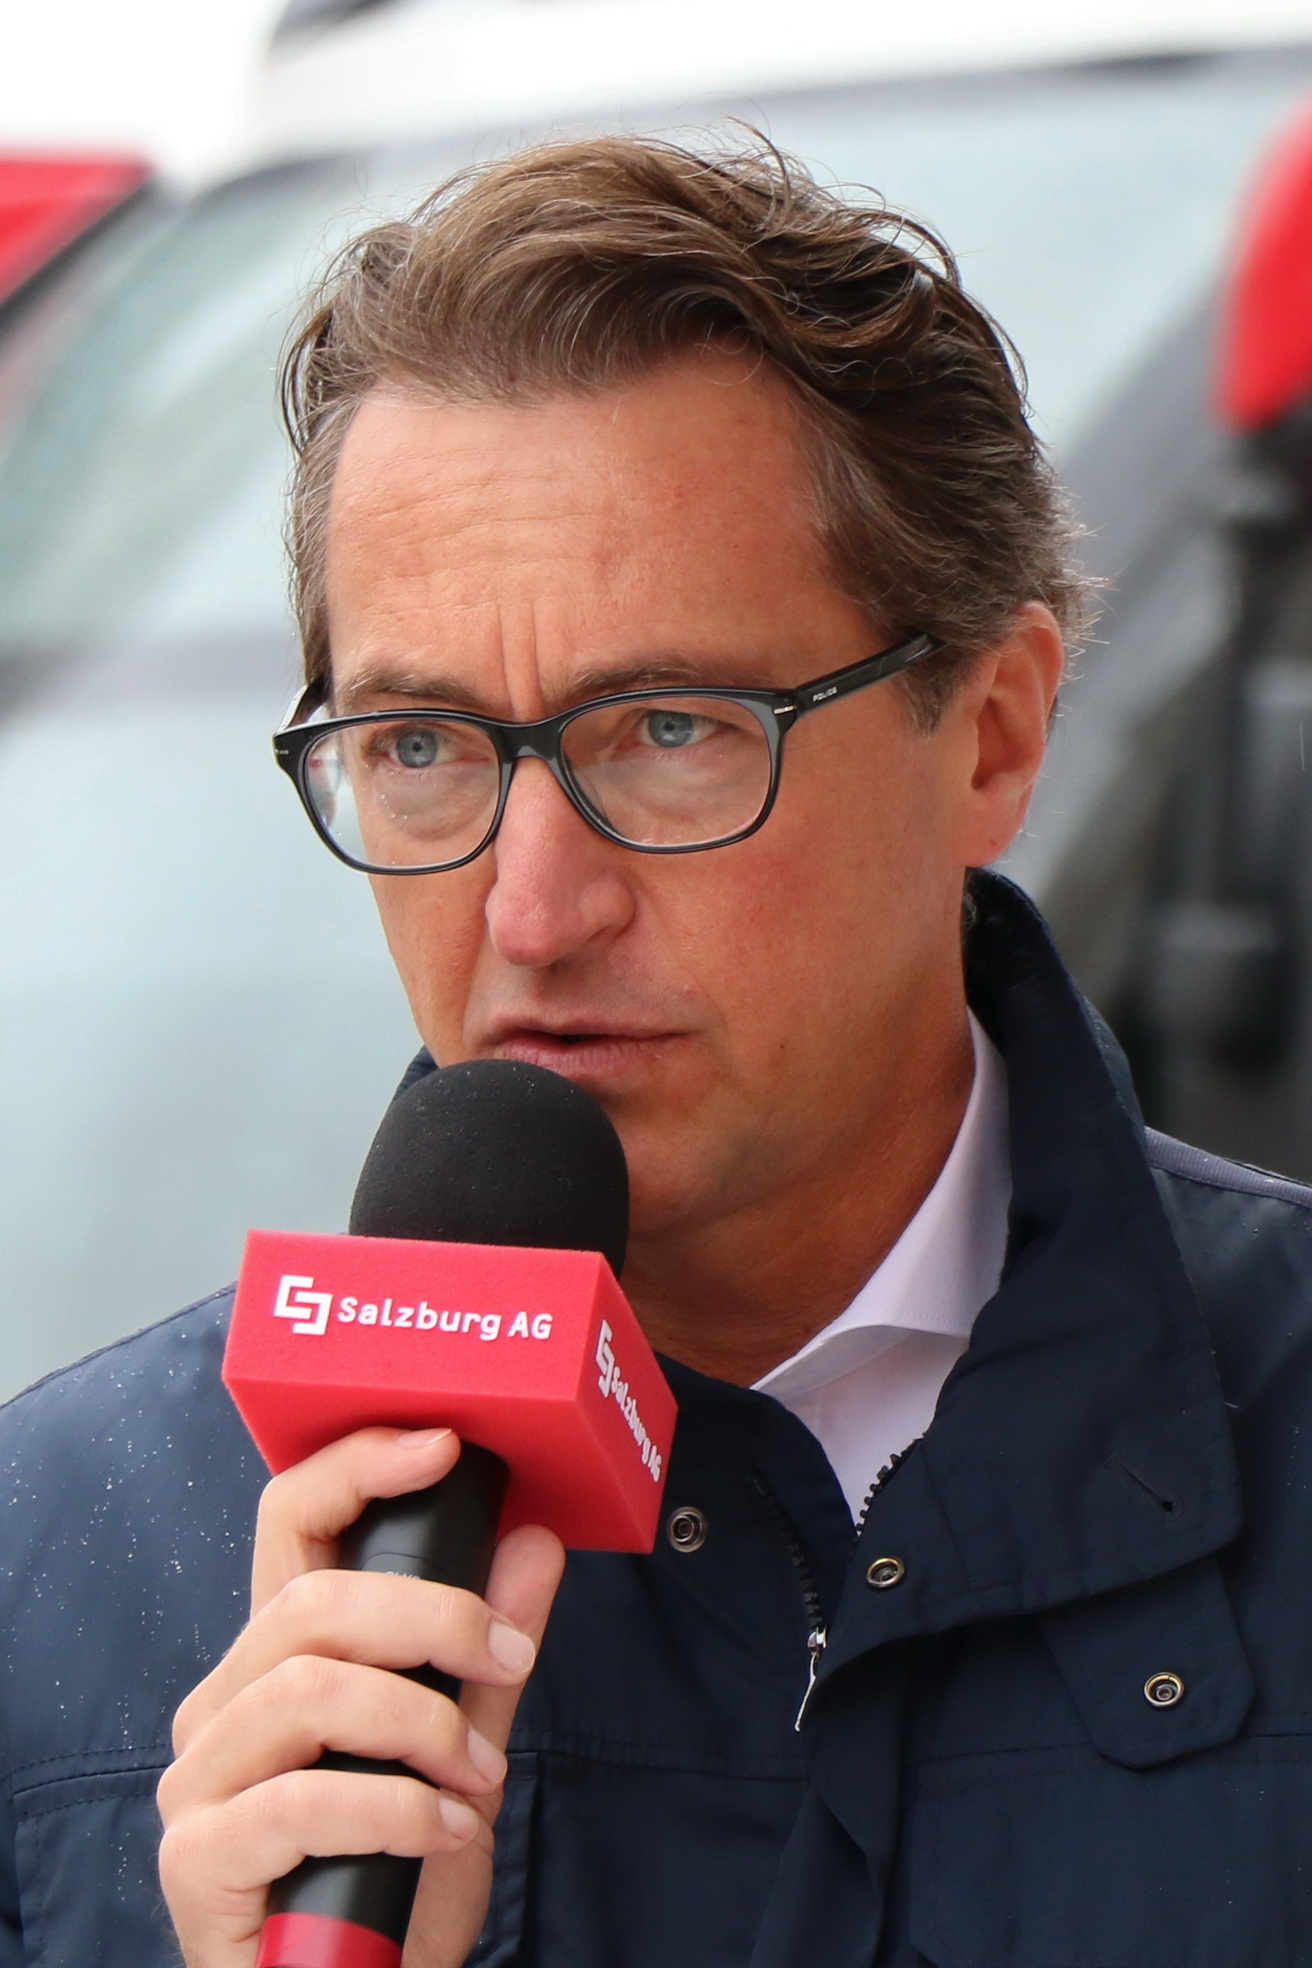 Dr. Leonhard Schitter, Vorstand Salzburg AG - 20150623fmt_obus_fm_11